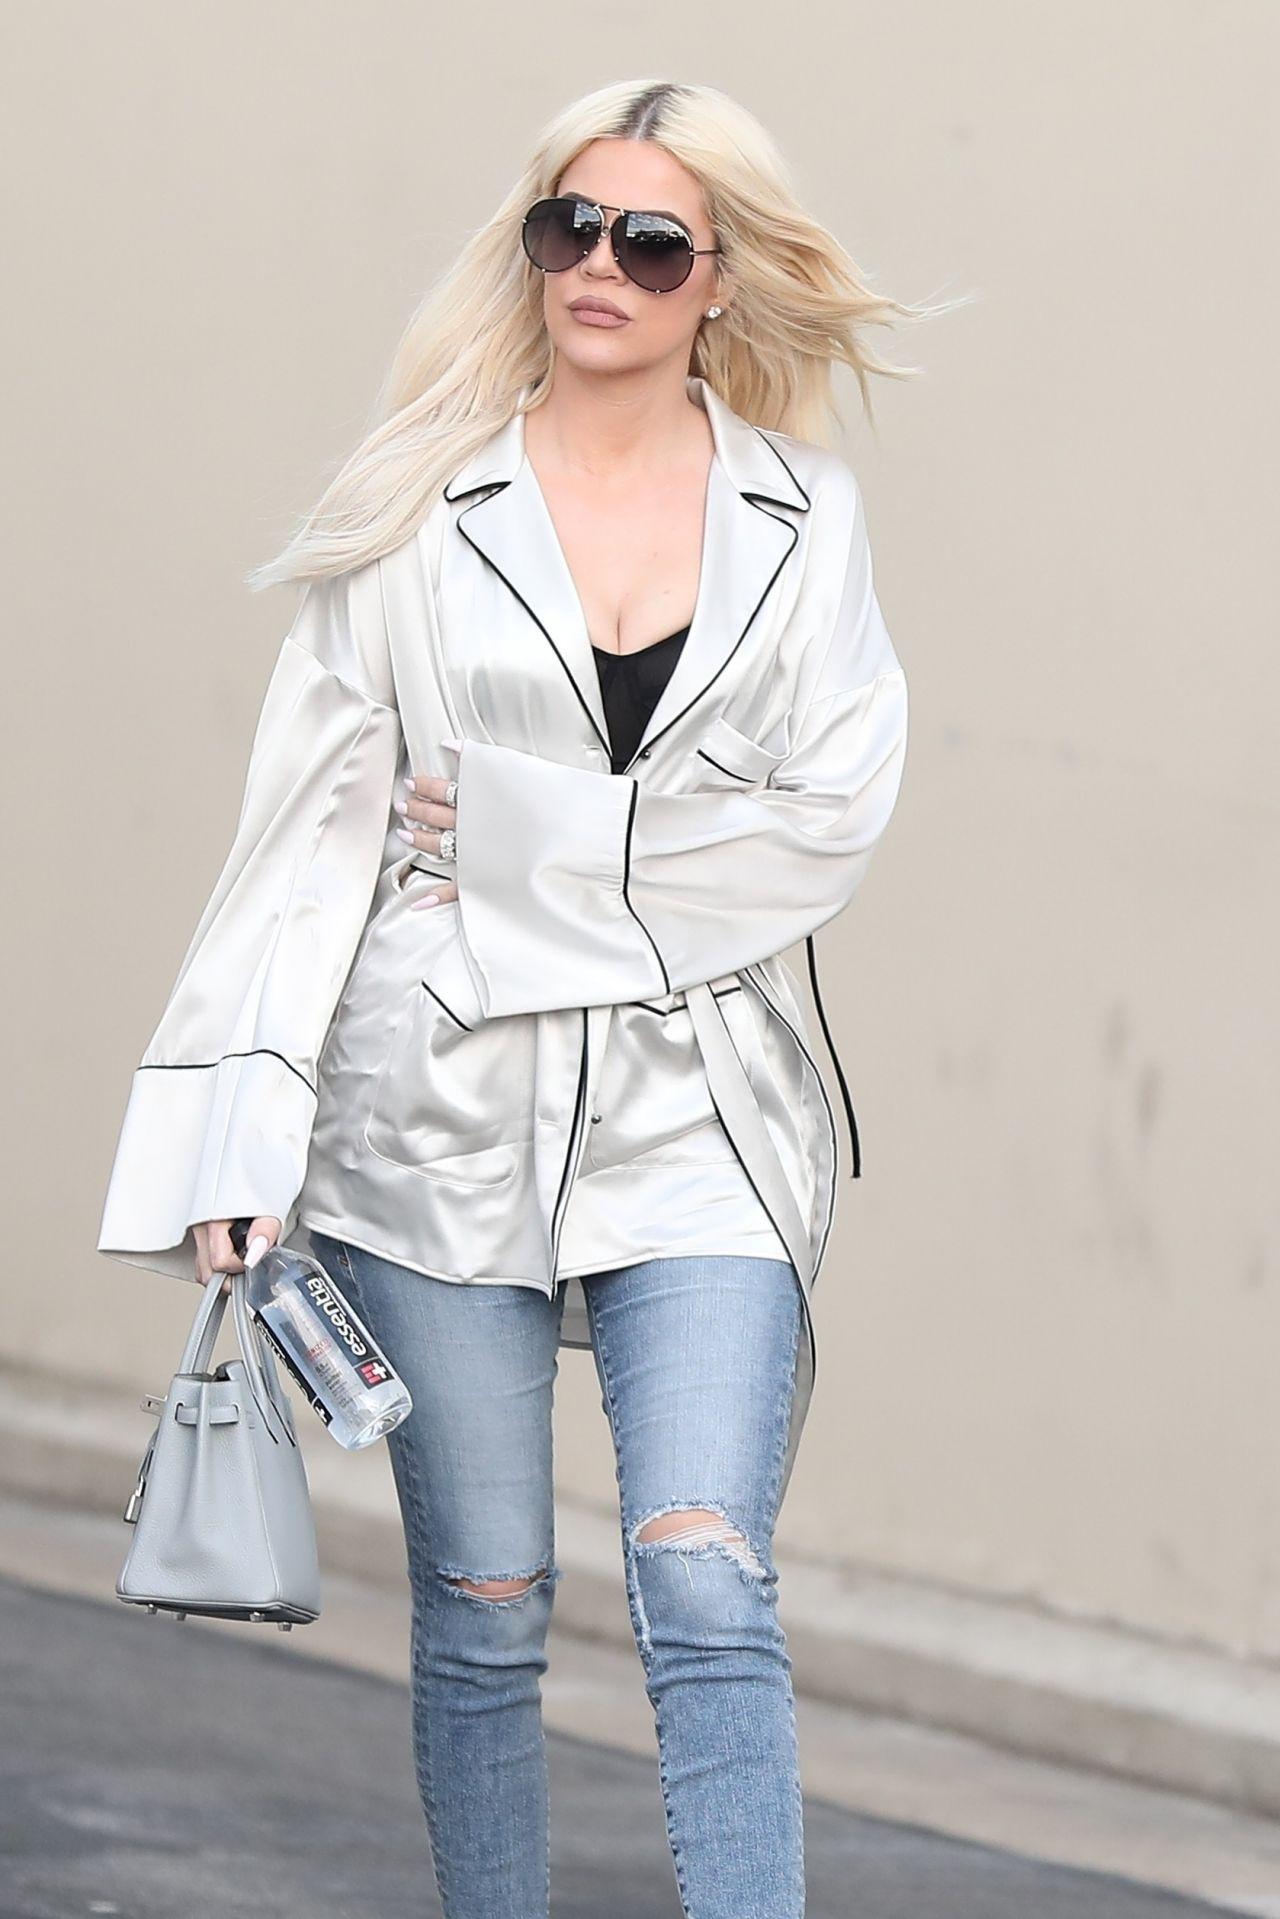 Khloe Kardashian Leaving A Studio In Calabasas 01 09 2019